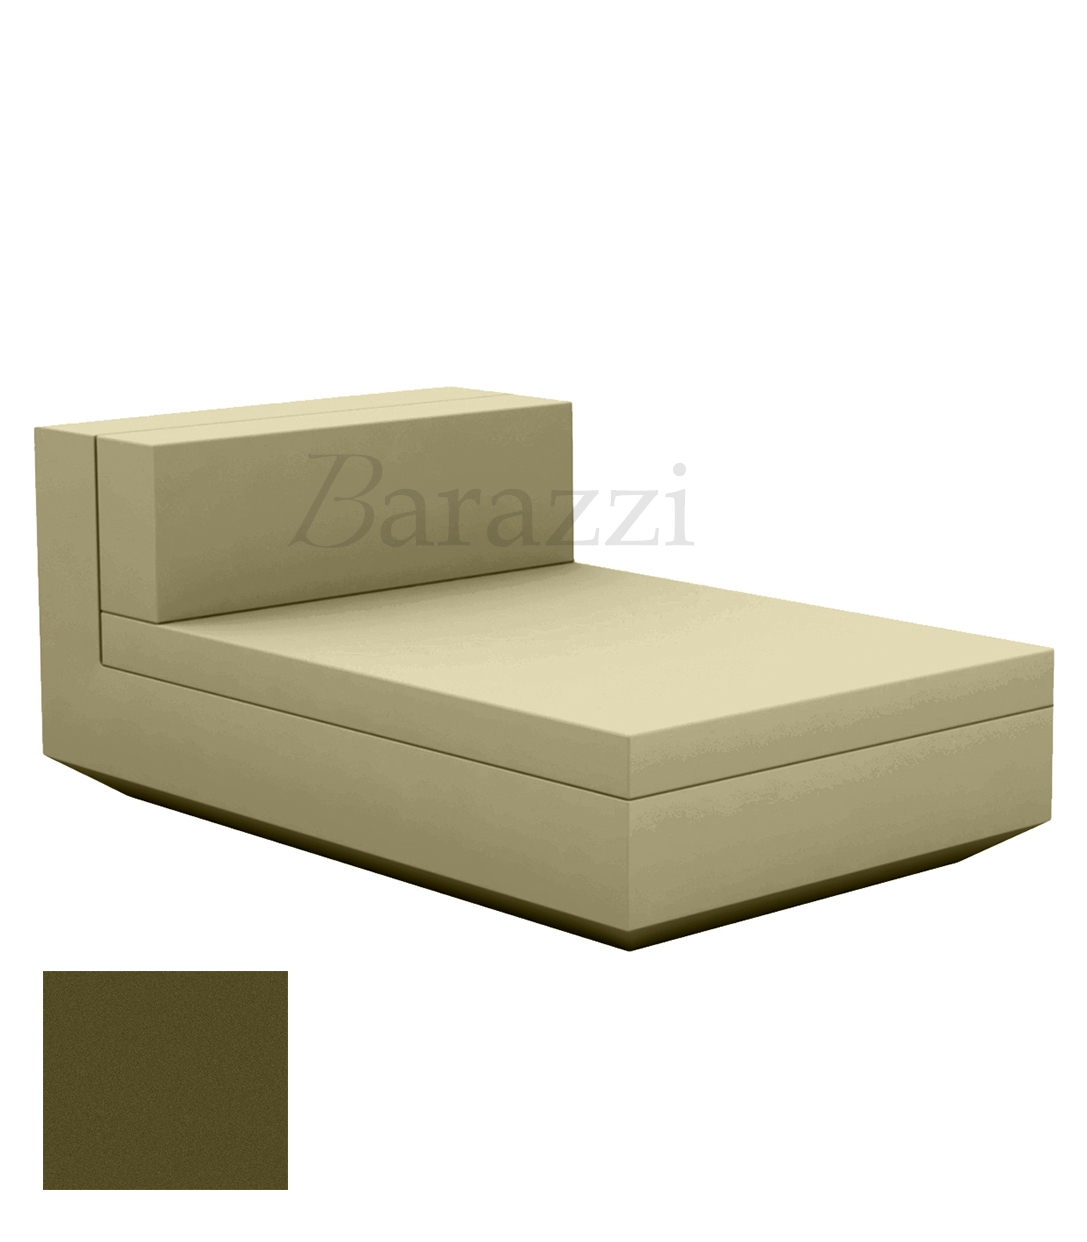 Outdoor Sectional Matt Couch Central Vela Sofa By Vondom